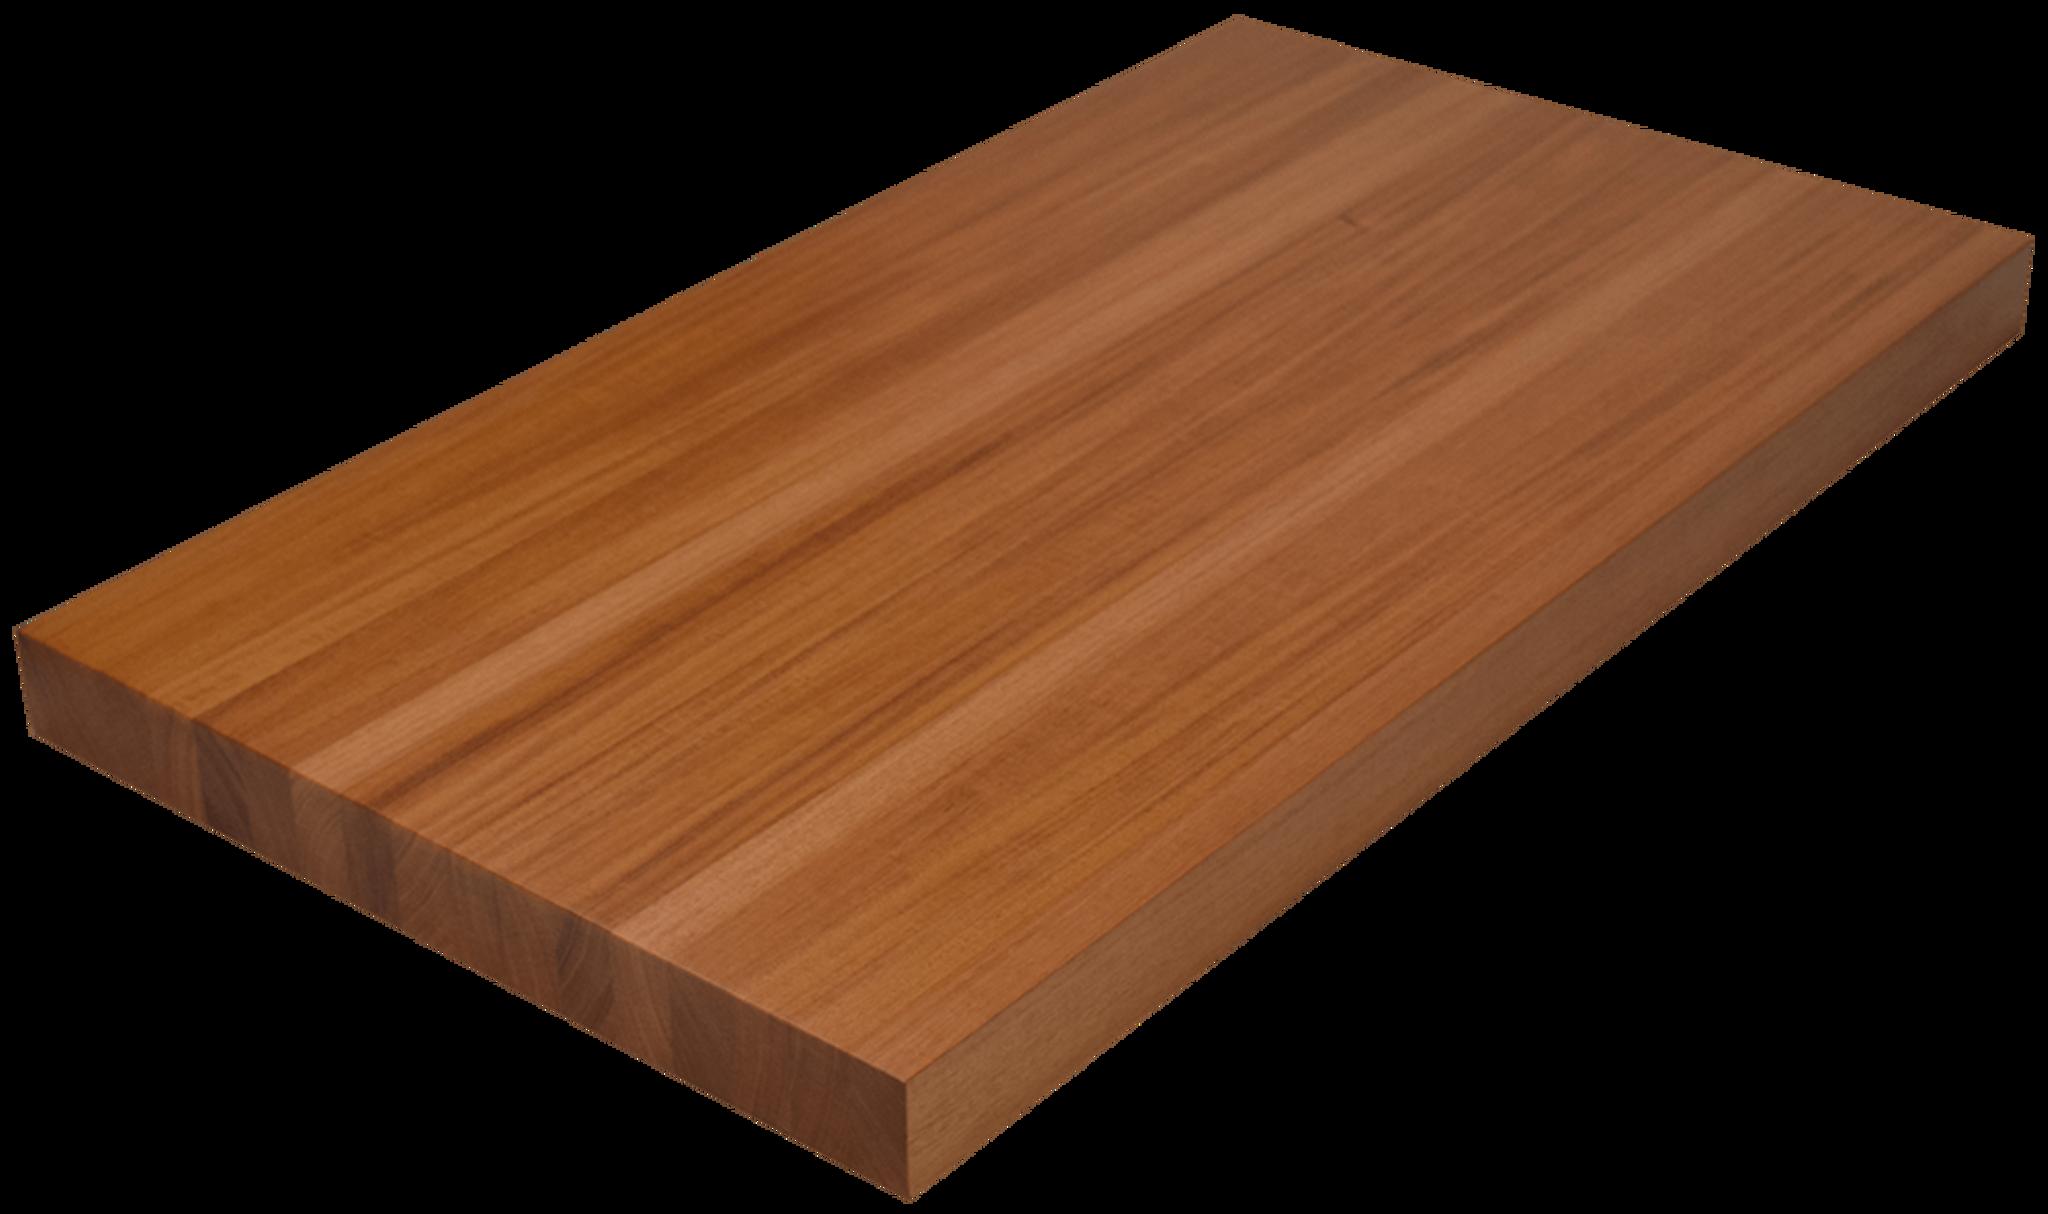 genuine mahogany edge grain butcher block countertop hardwood lumber company. Black Bedroom Furniture Sets. Home Design Ideas